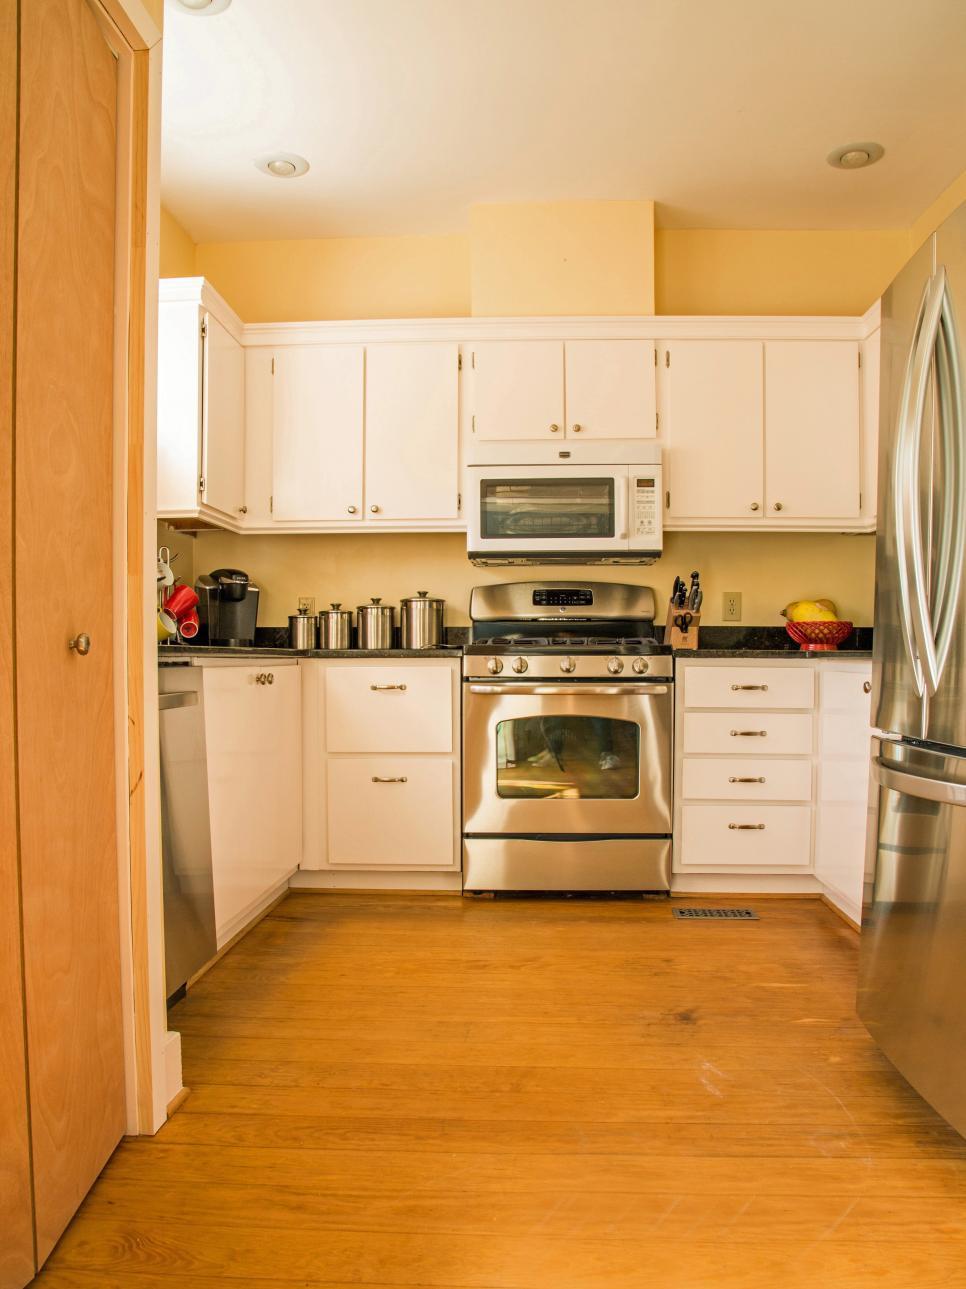 Best ideas about Diy Kitchen Ideas On A Budget . Save or Pin Diy Kitchen Ideas A Bud Now.